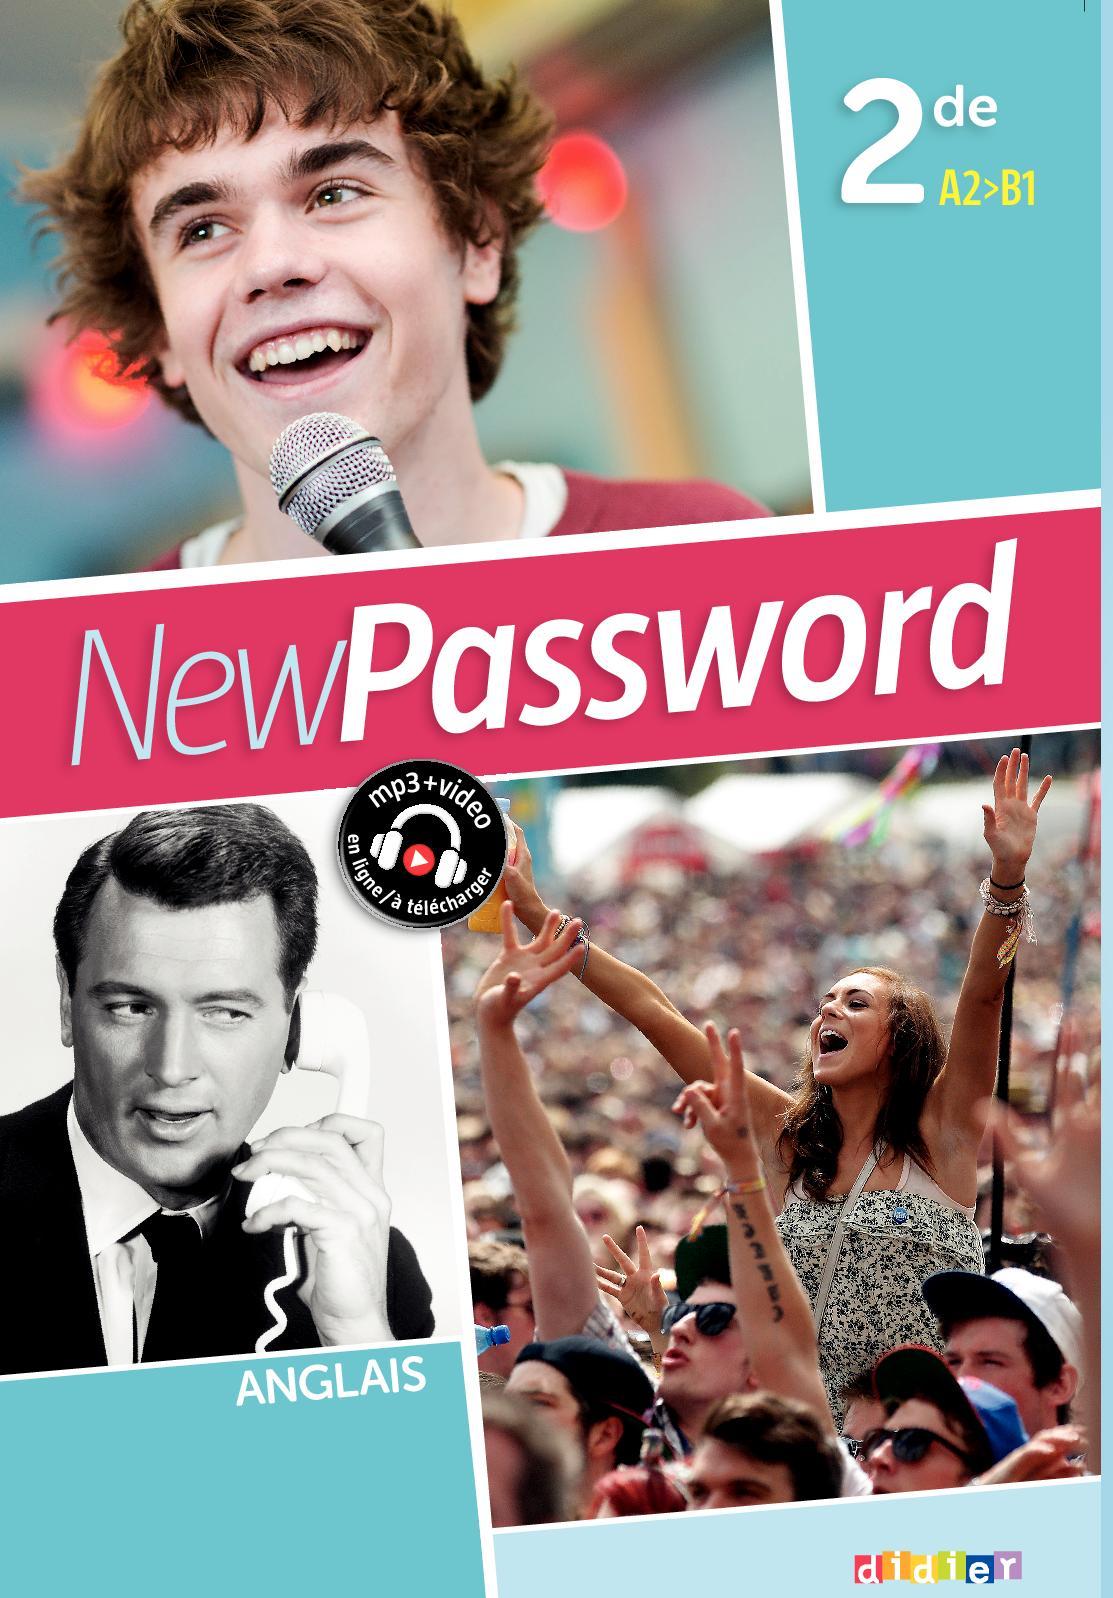 Calameo New Password 2de